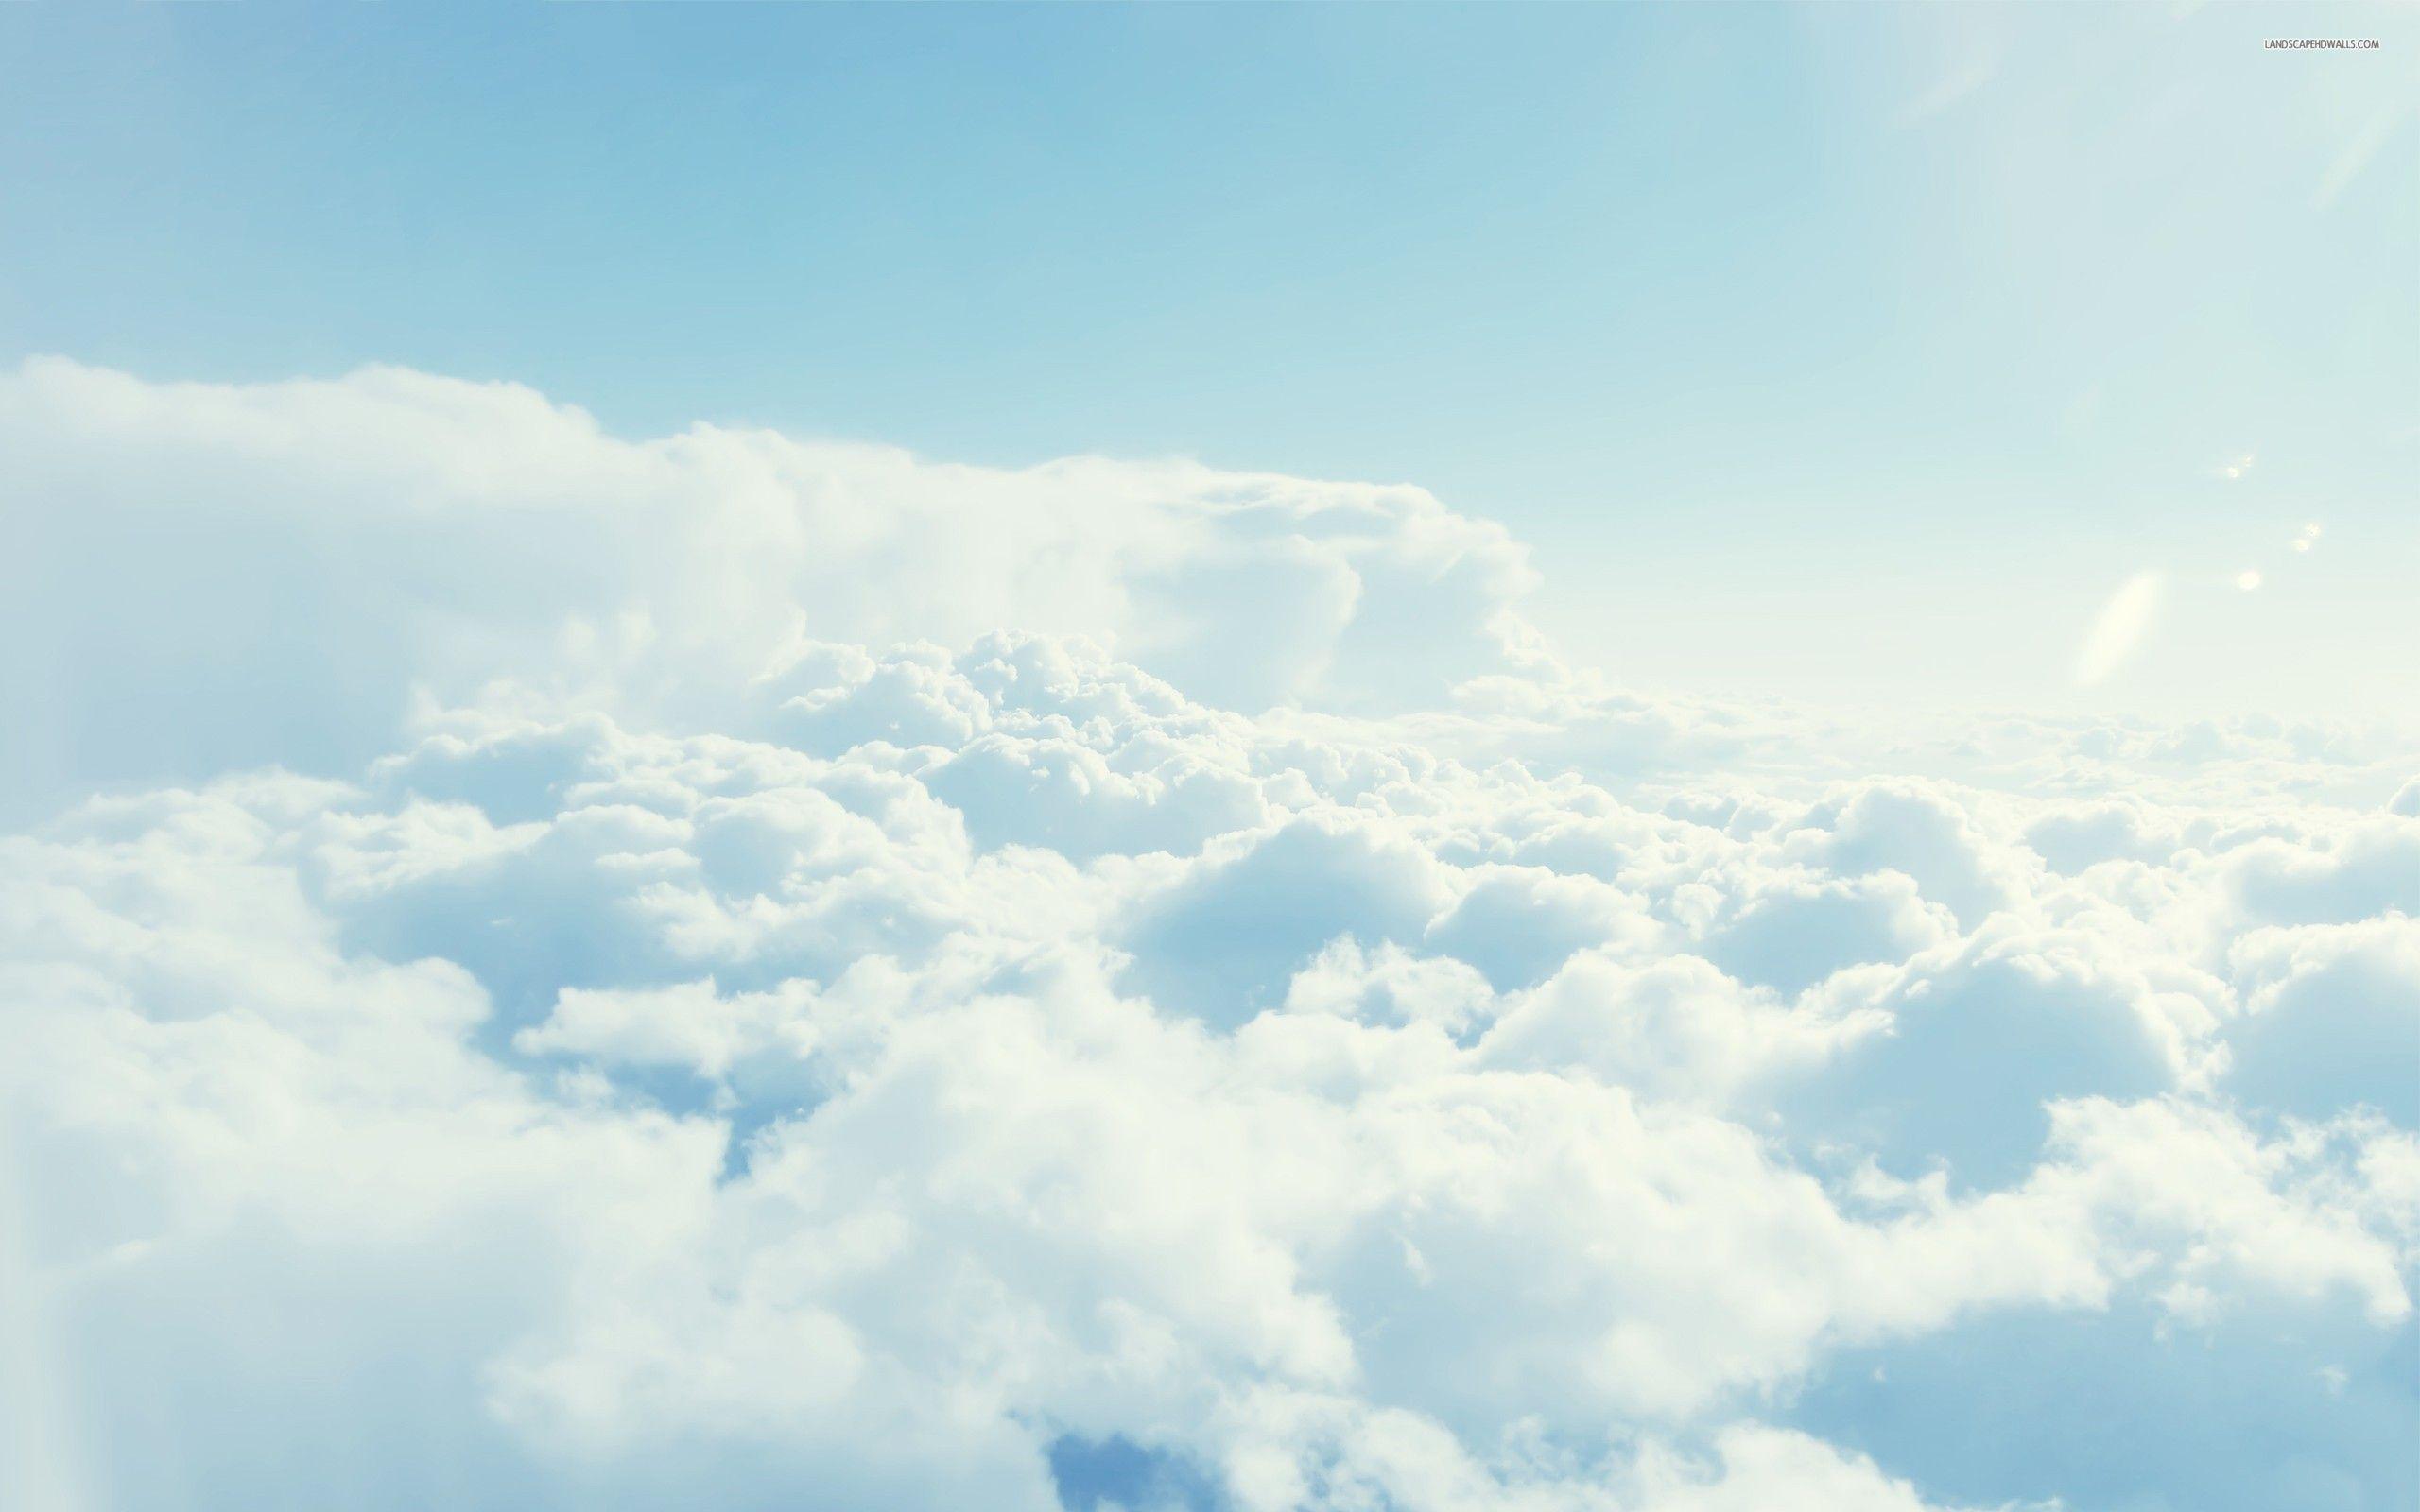 Aesthetic Cloud Desktop Wallpapers On Wallpaperdog